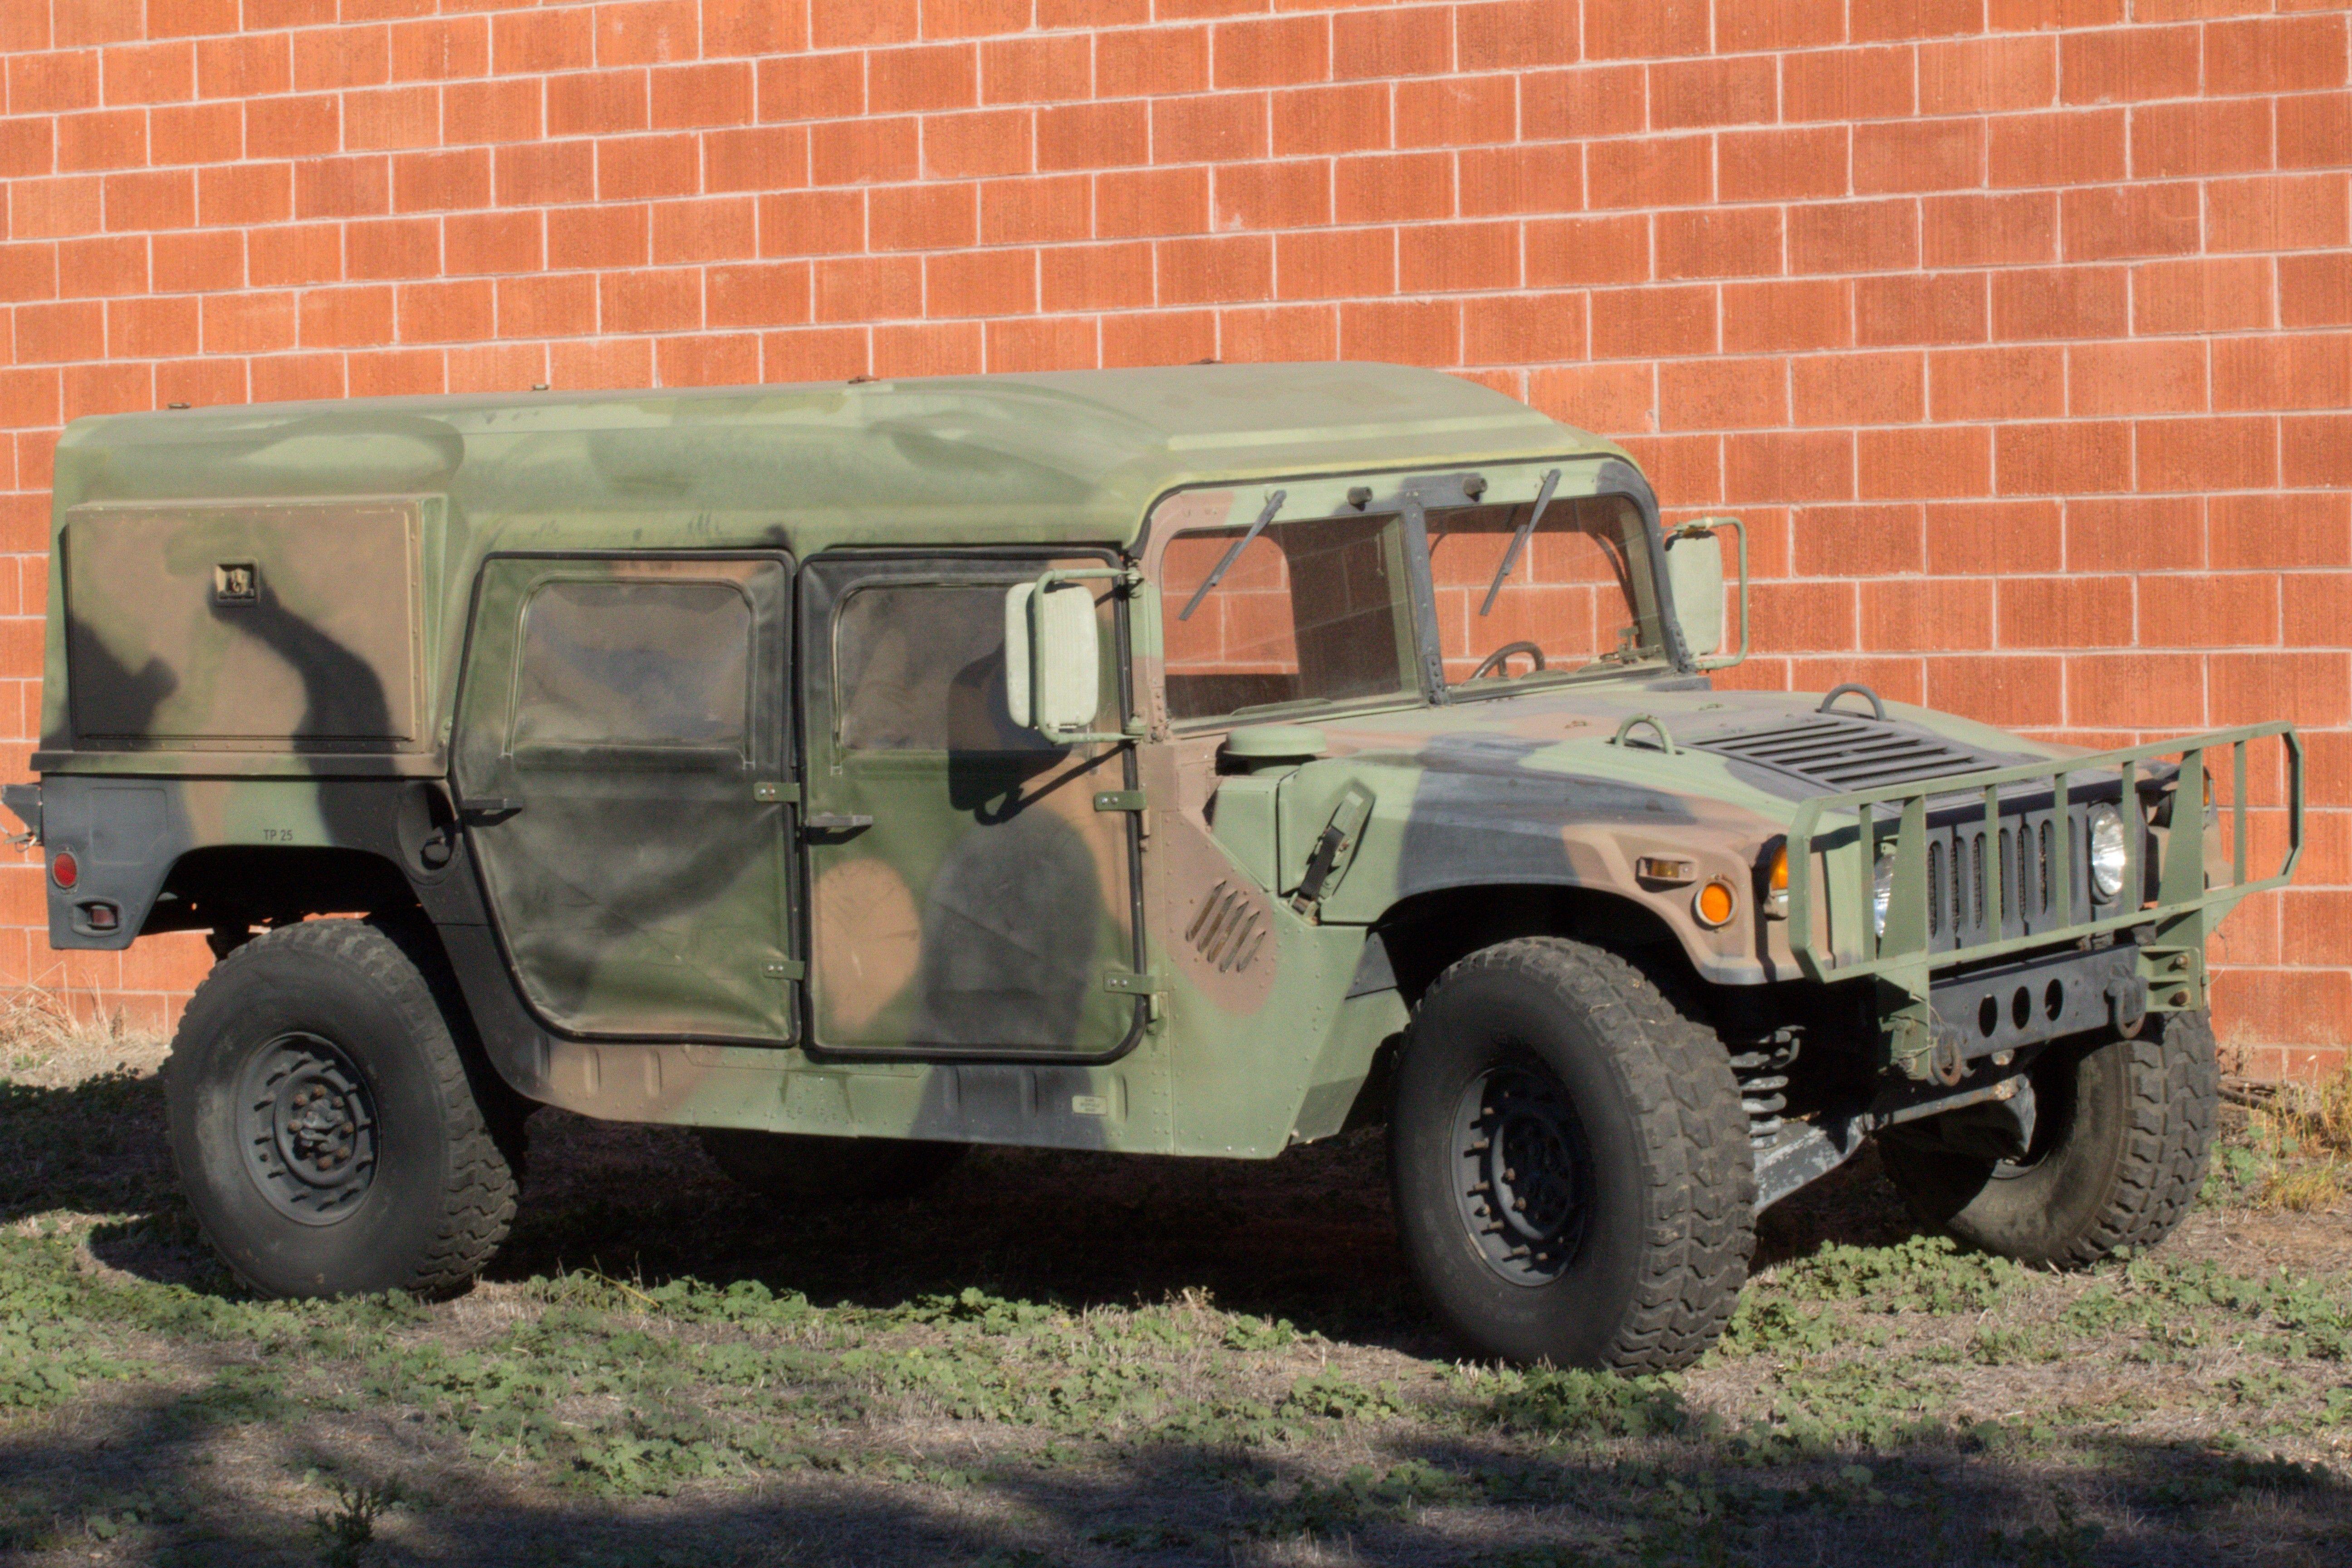 1990 AM GENERAL M998 HUMVEE HMMWV A 1990 GENUINE US MILITARY